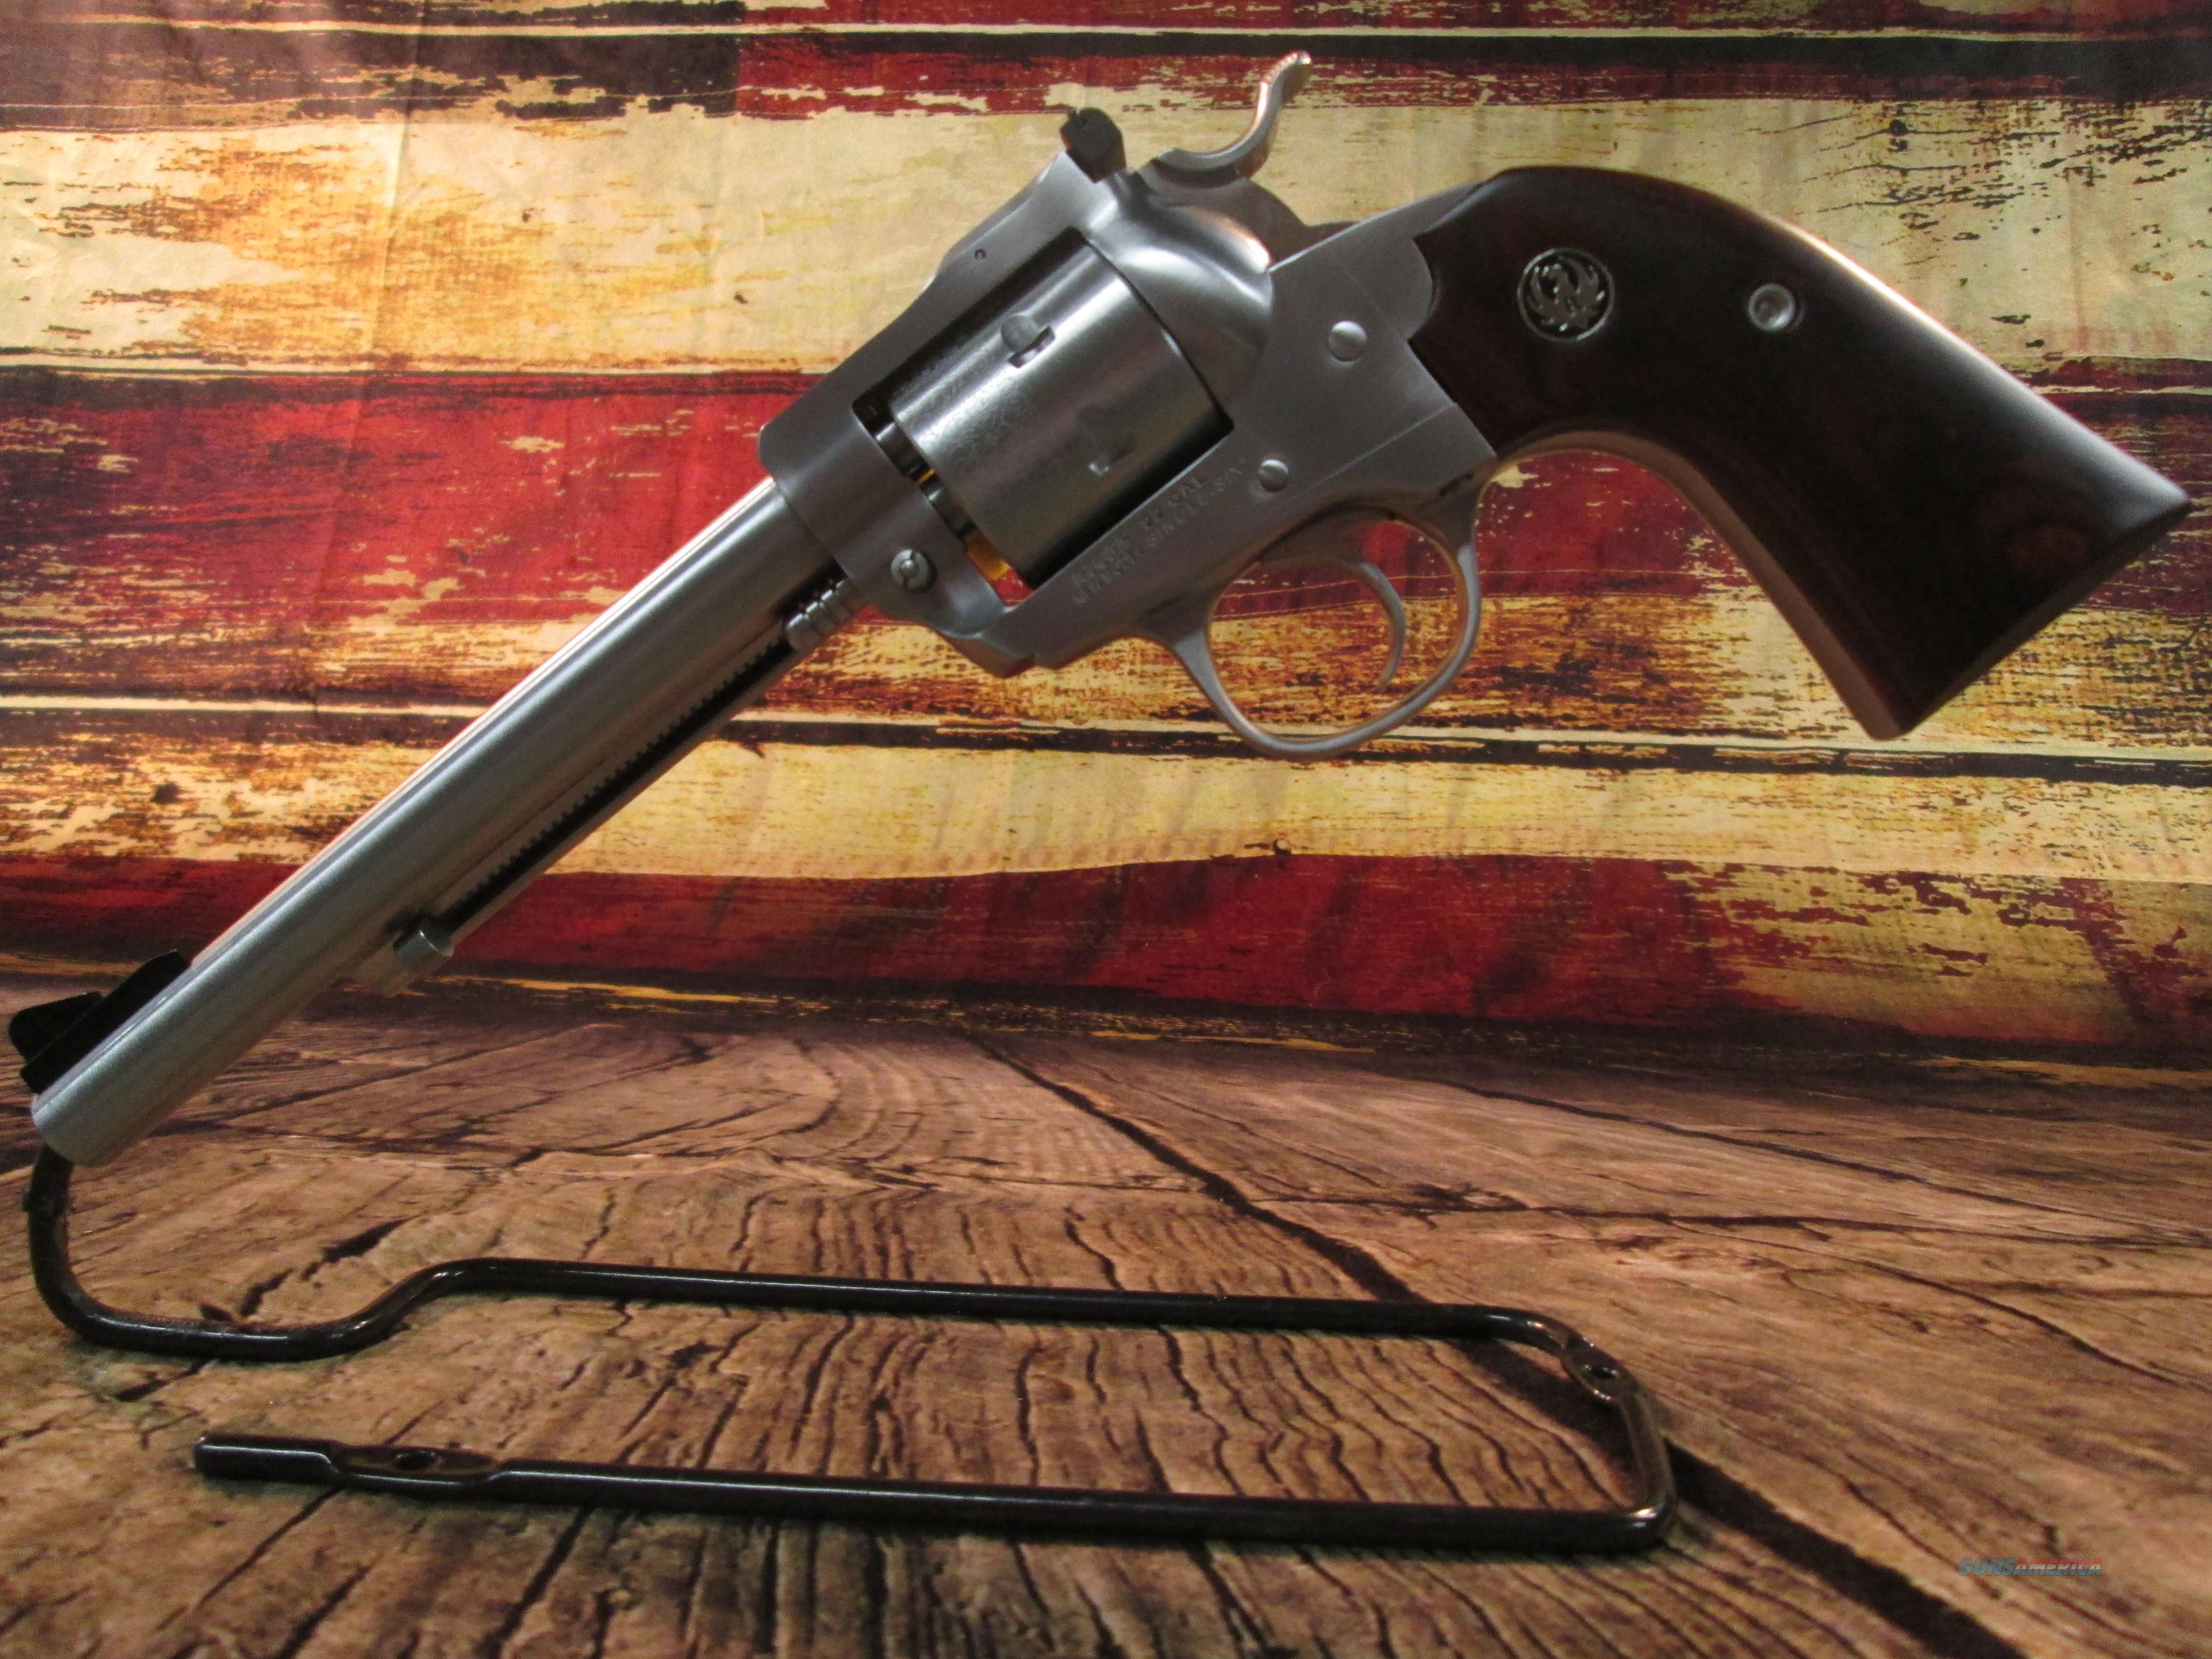 "RUGER NEW MODEL BISLEY SINGLE SIX .22 LR 6.5"" STAINLESS BARREL (00680)   Guns > Pistols > Ruger Single Action Revolvers > Single Six Type"